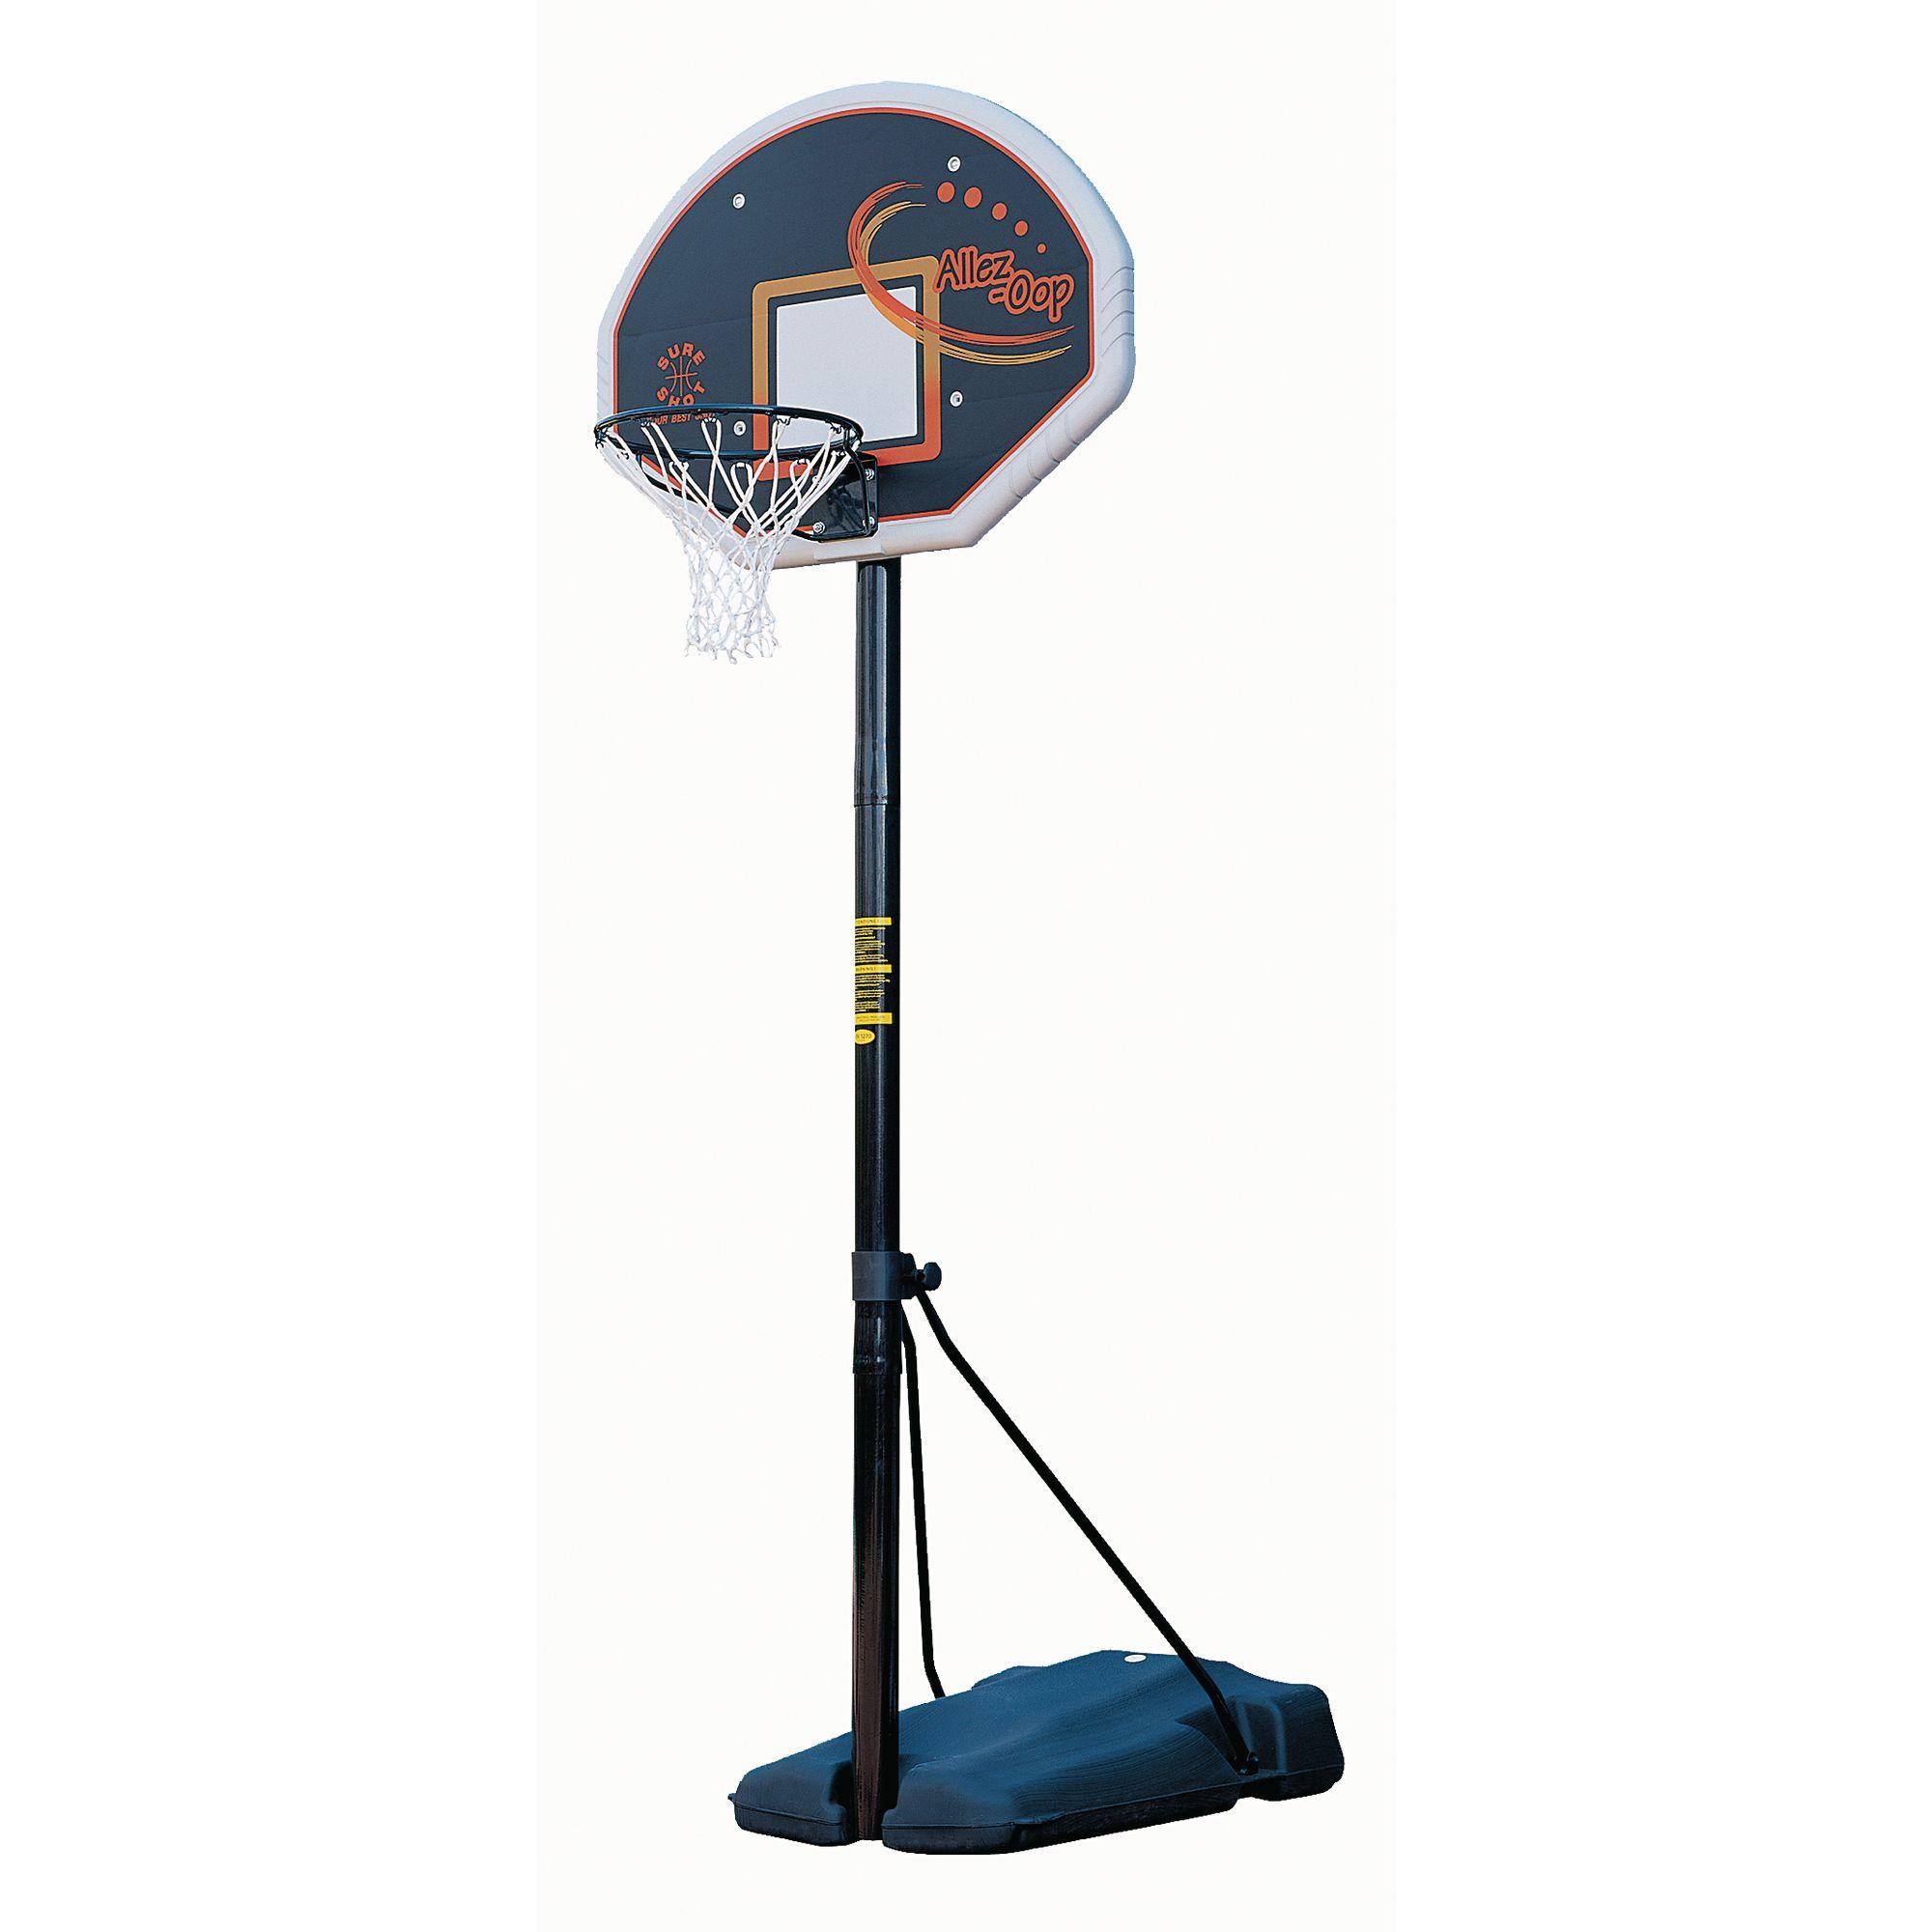 Portable Sports Fan : Product davies sports